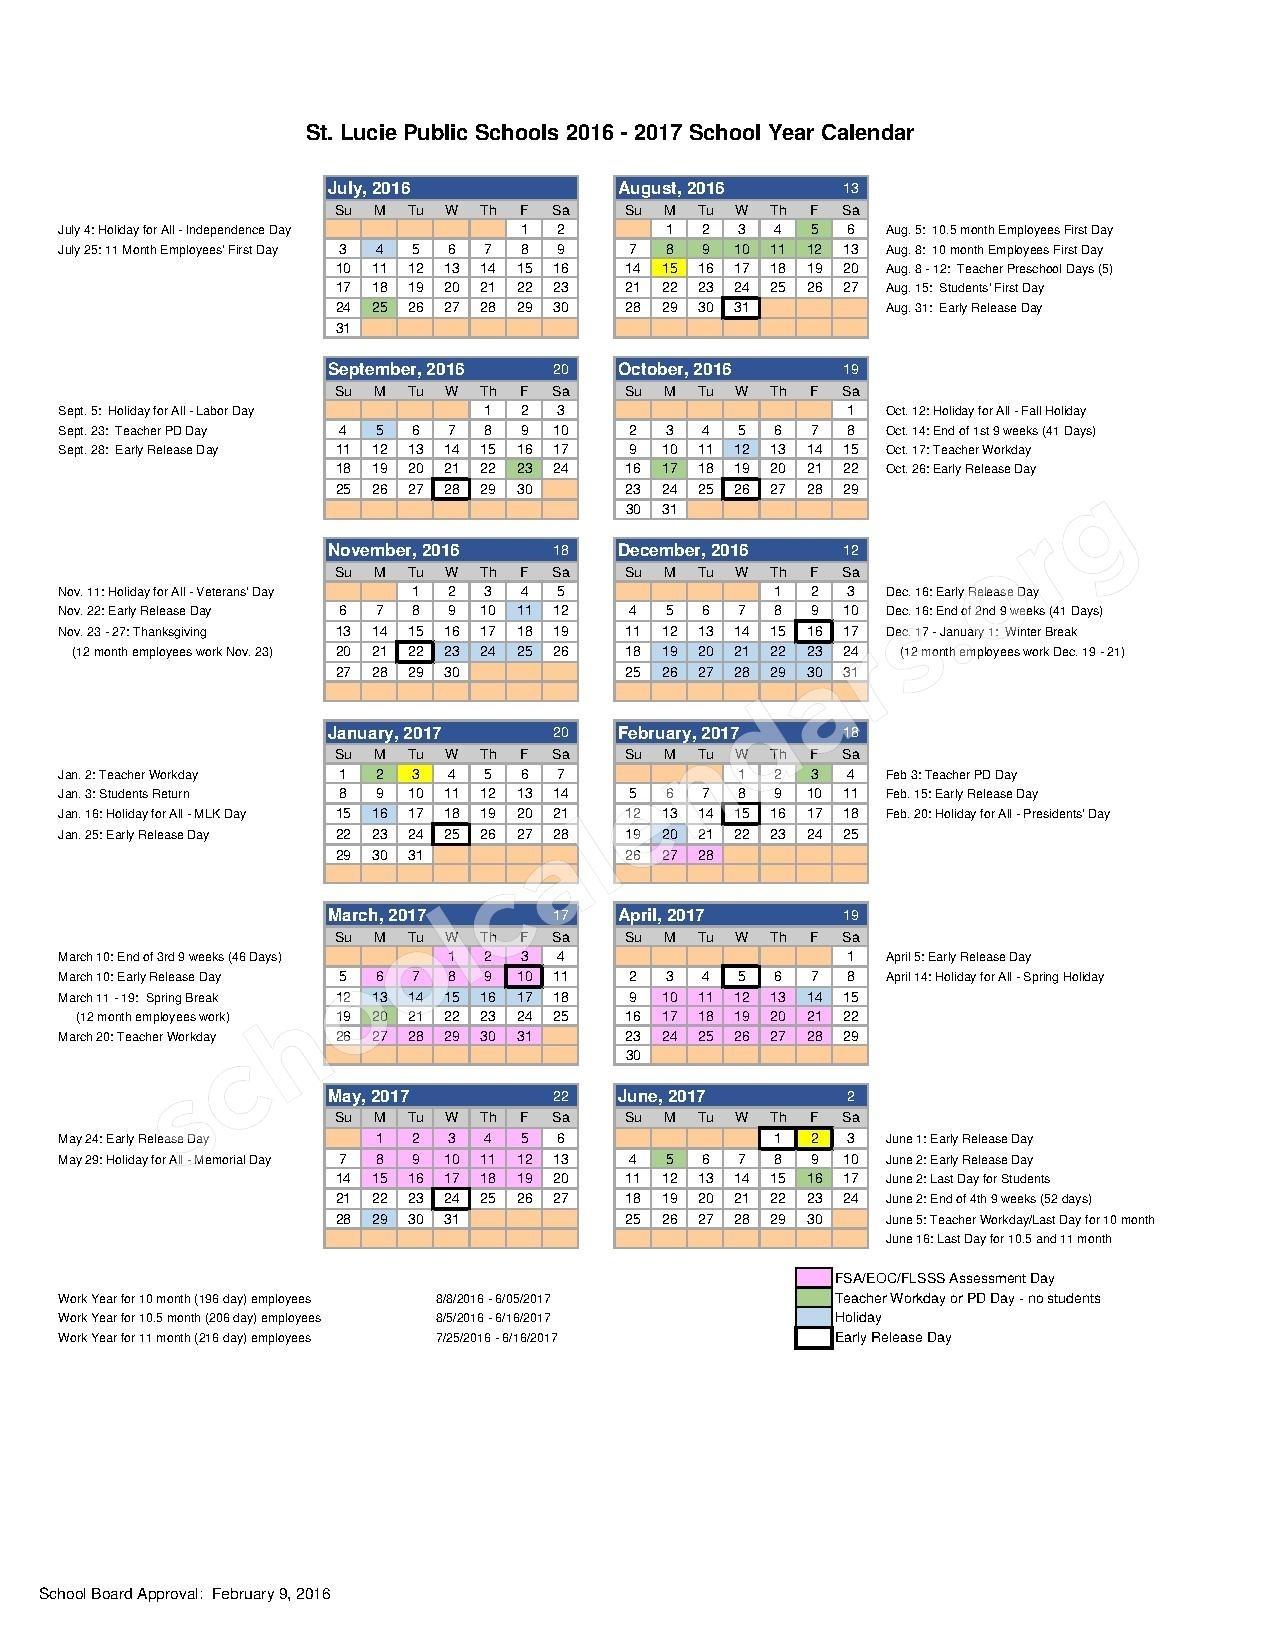 2016 - 2017 School Calendar   St. Lucie County School District_School Calendar Port St Lucie